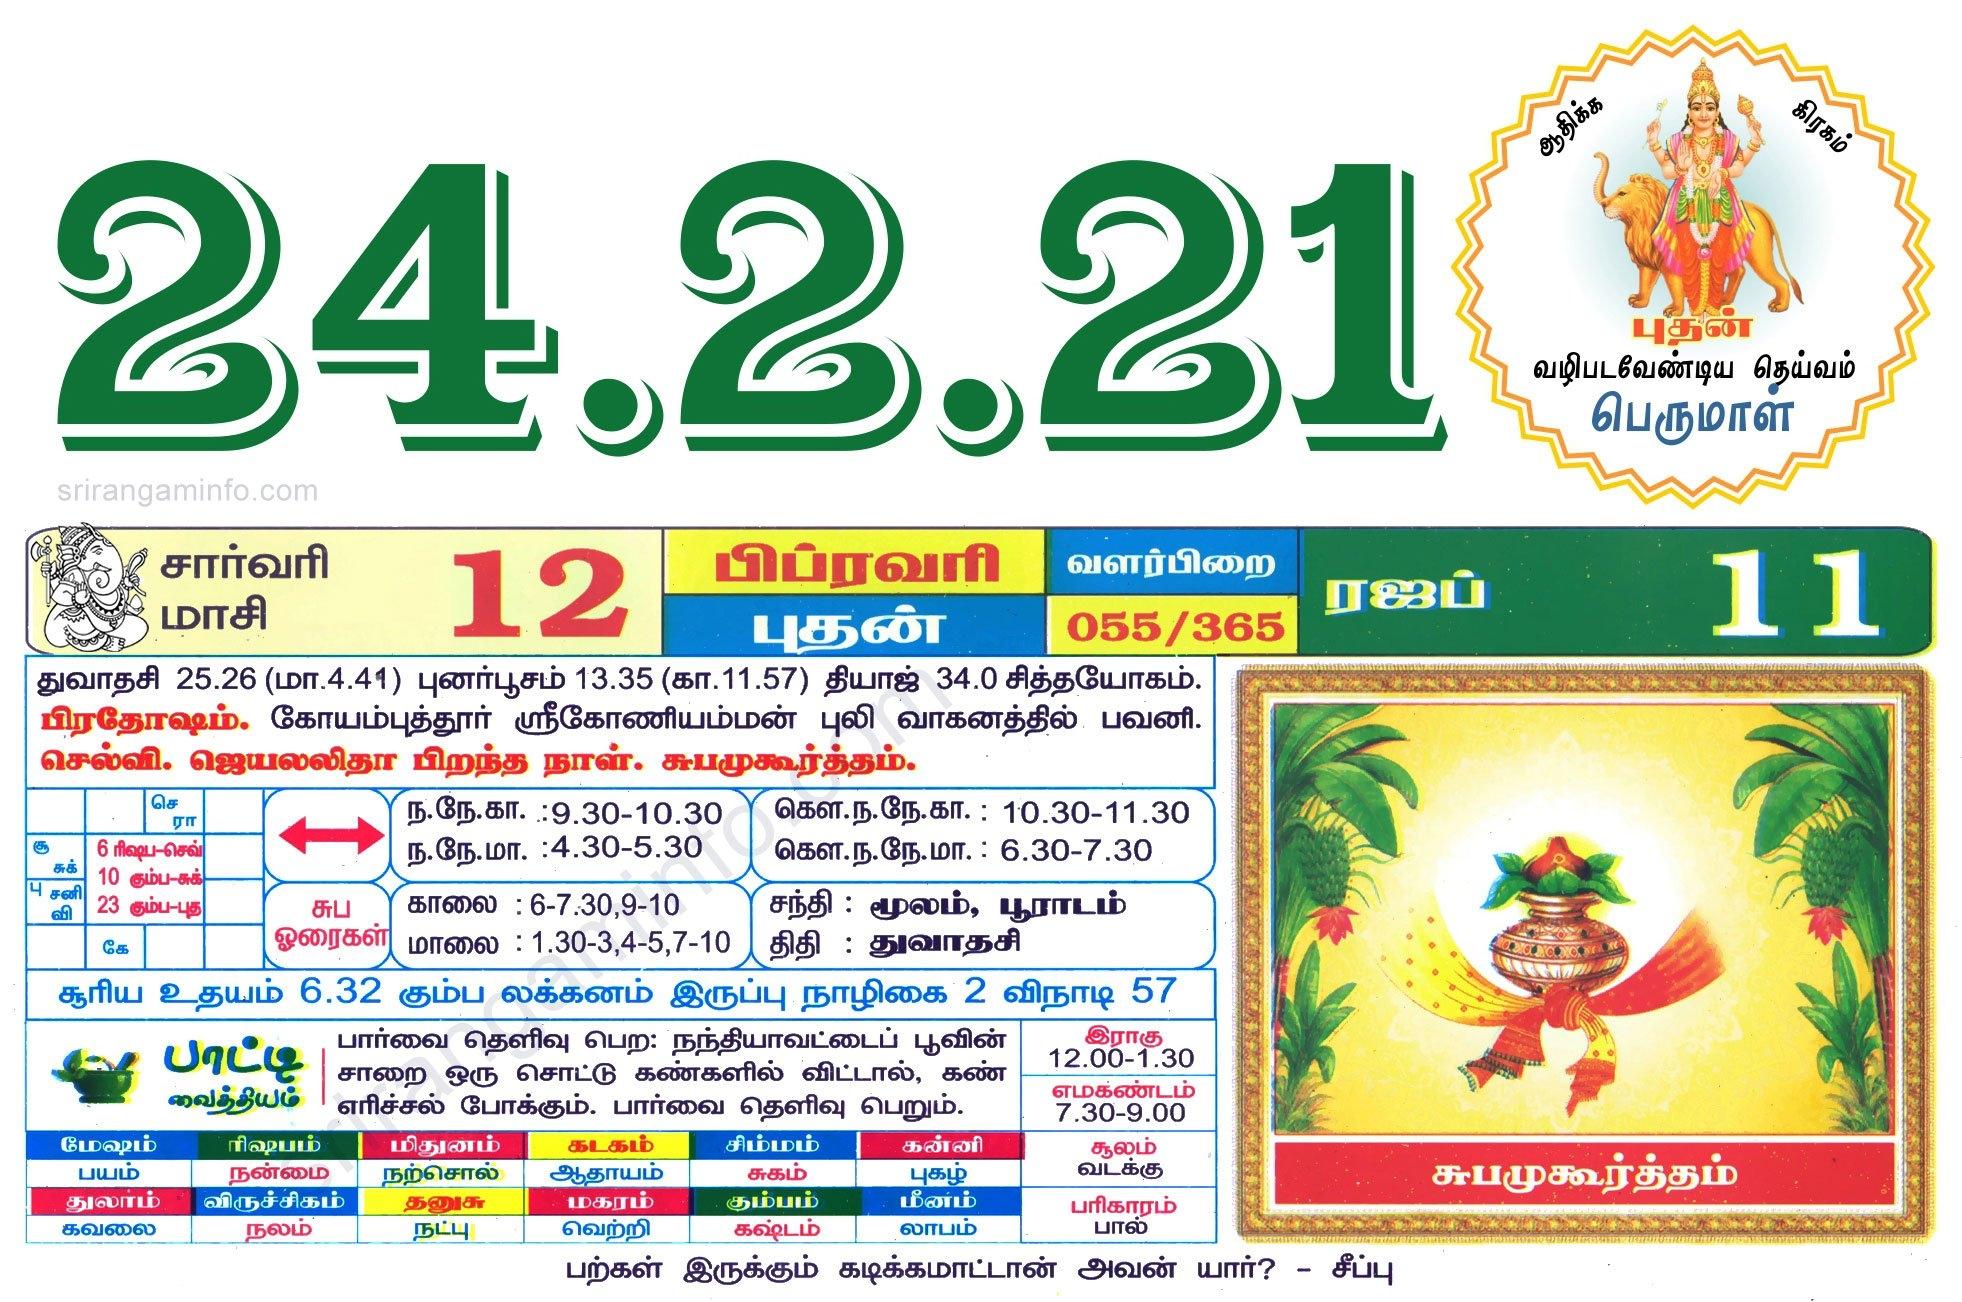 Tamil Daily Calendar 2021, Tamil Calendar 2021, Nalla Neram - தமிழ் தினசரி காலண்டர் in 2021 2021 Tamil Calendar